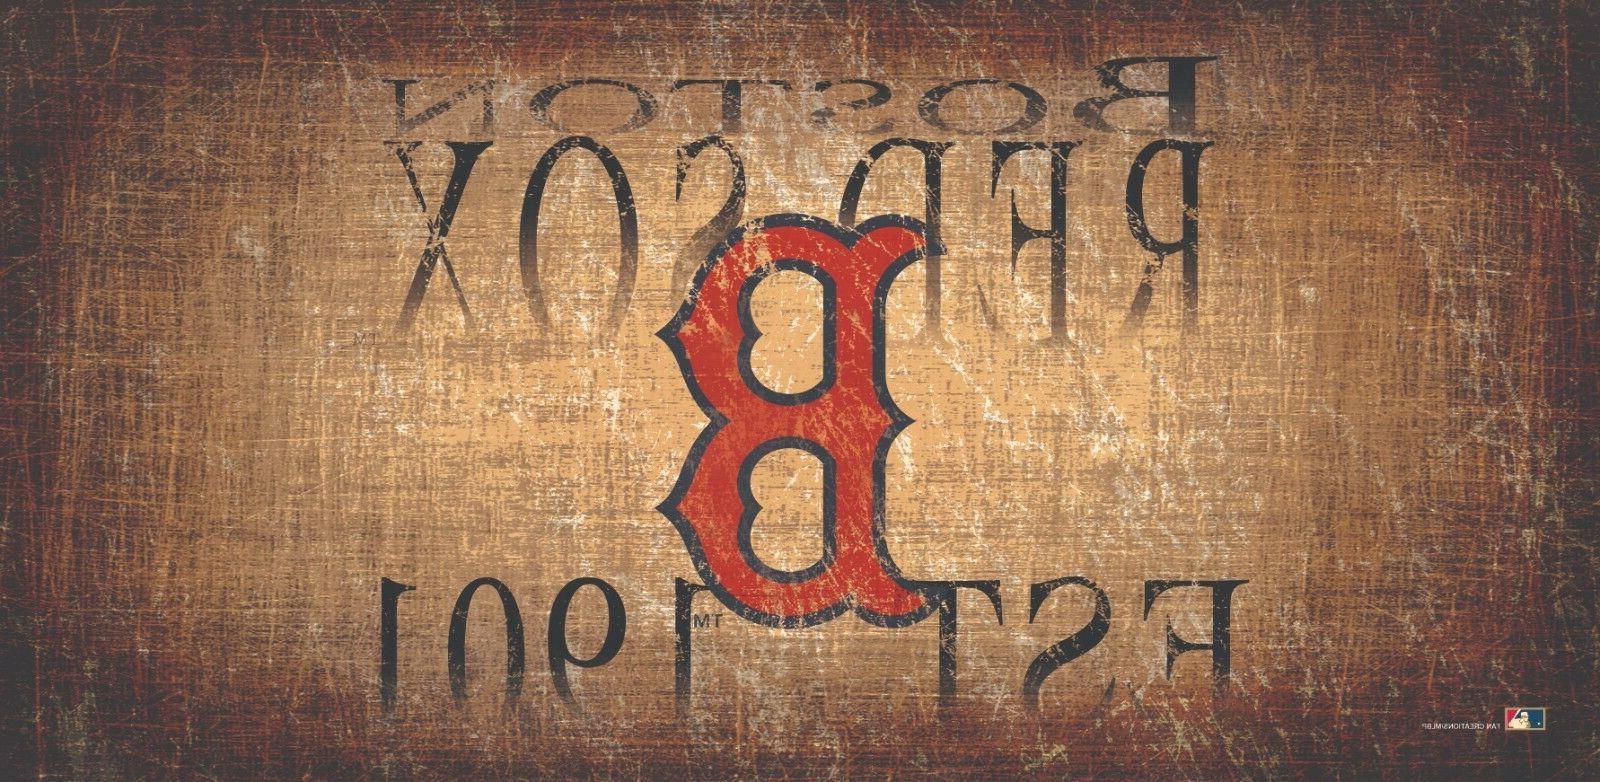 boston red sox heritage est 1901 wood